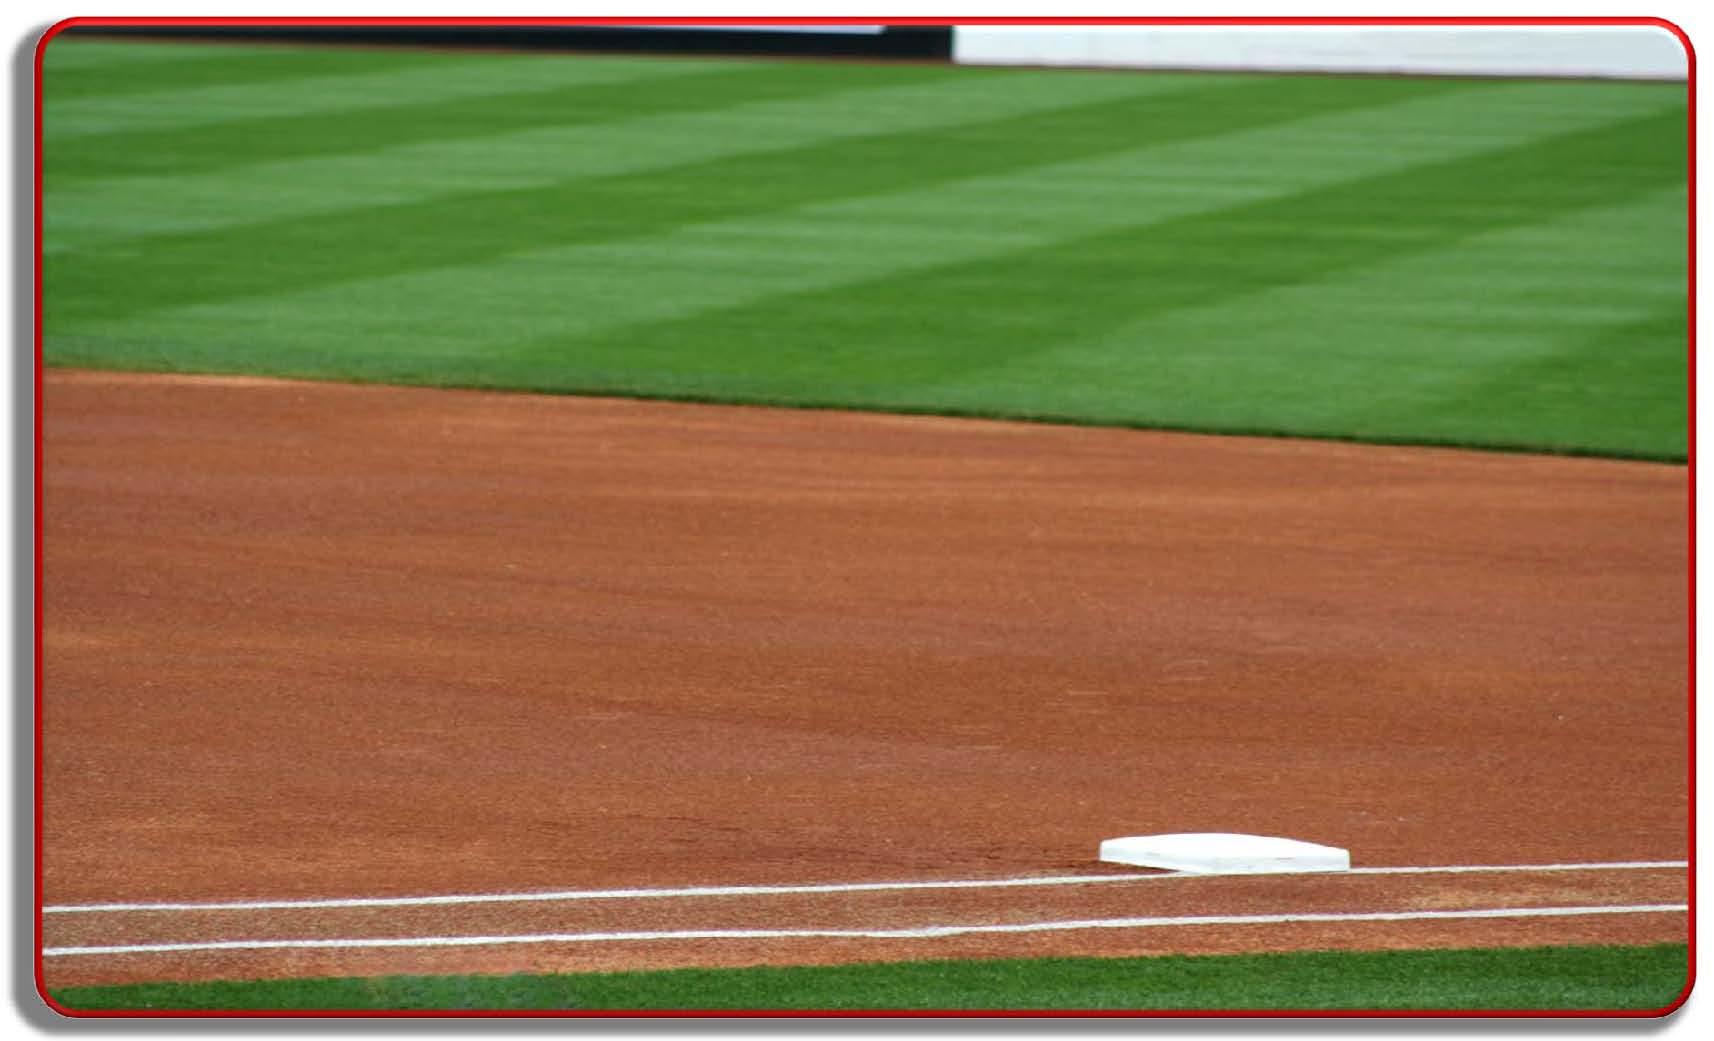 Baseball Field 1714x1041